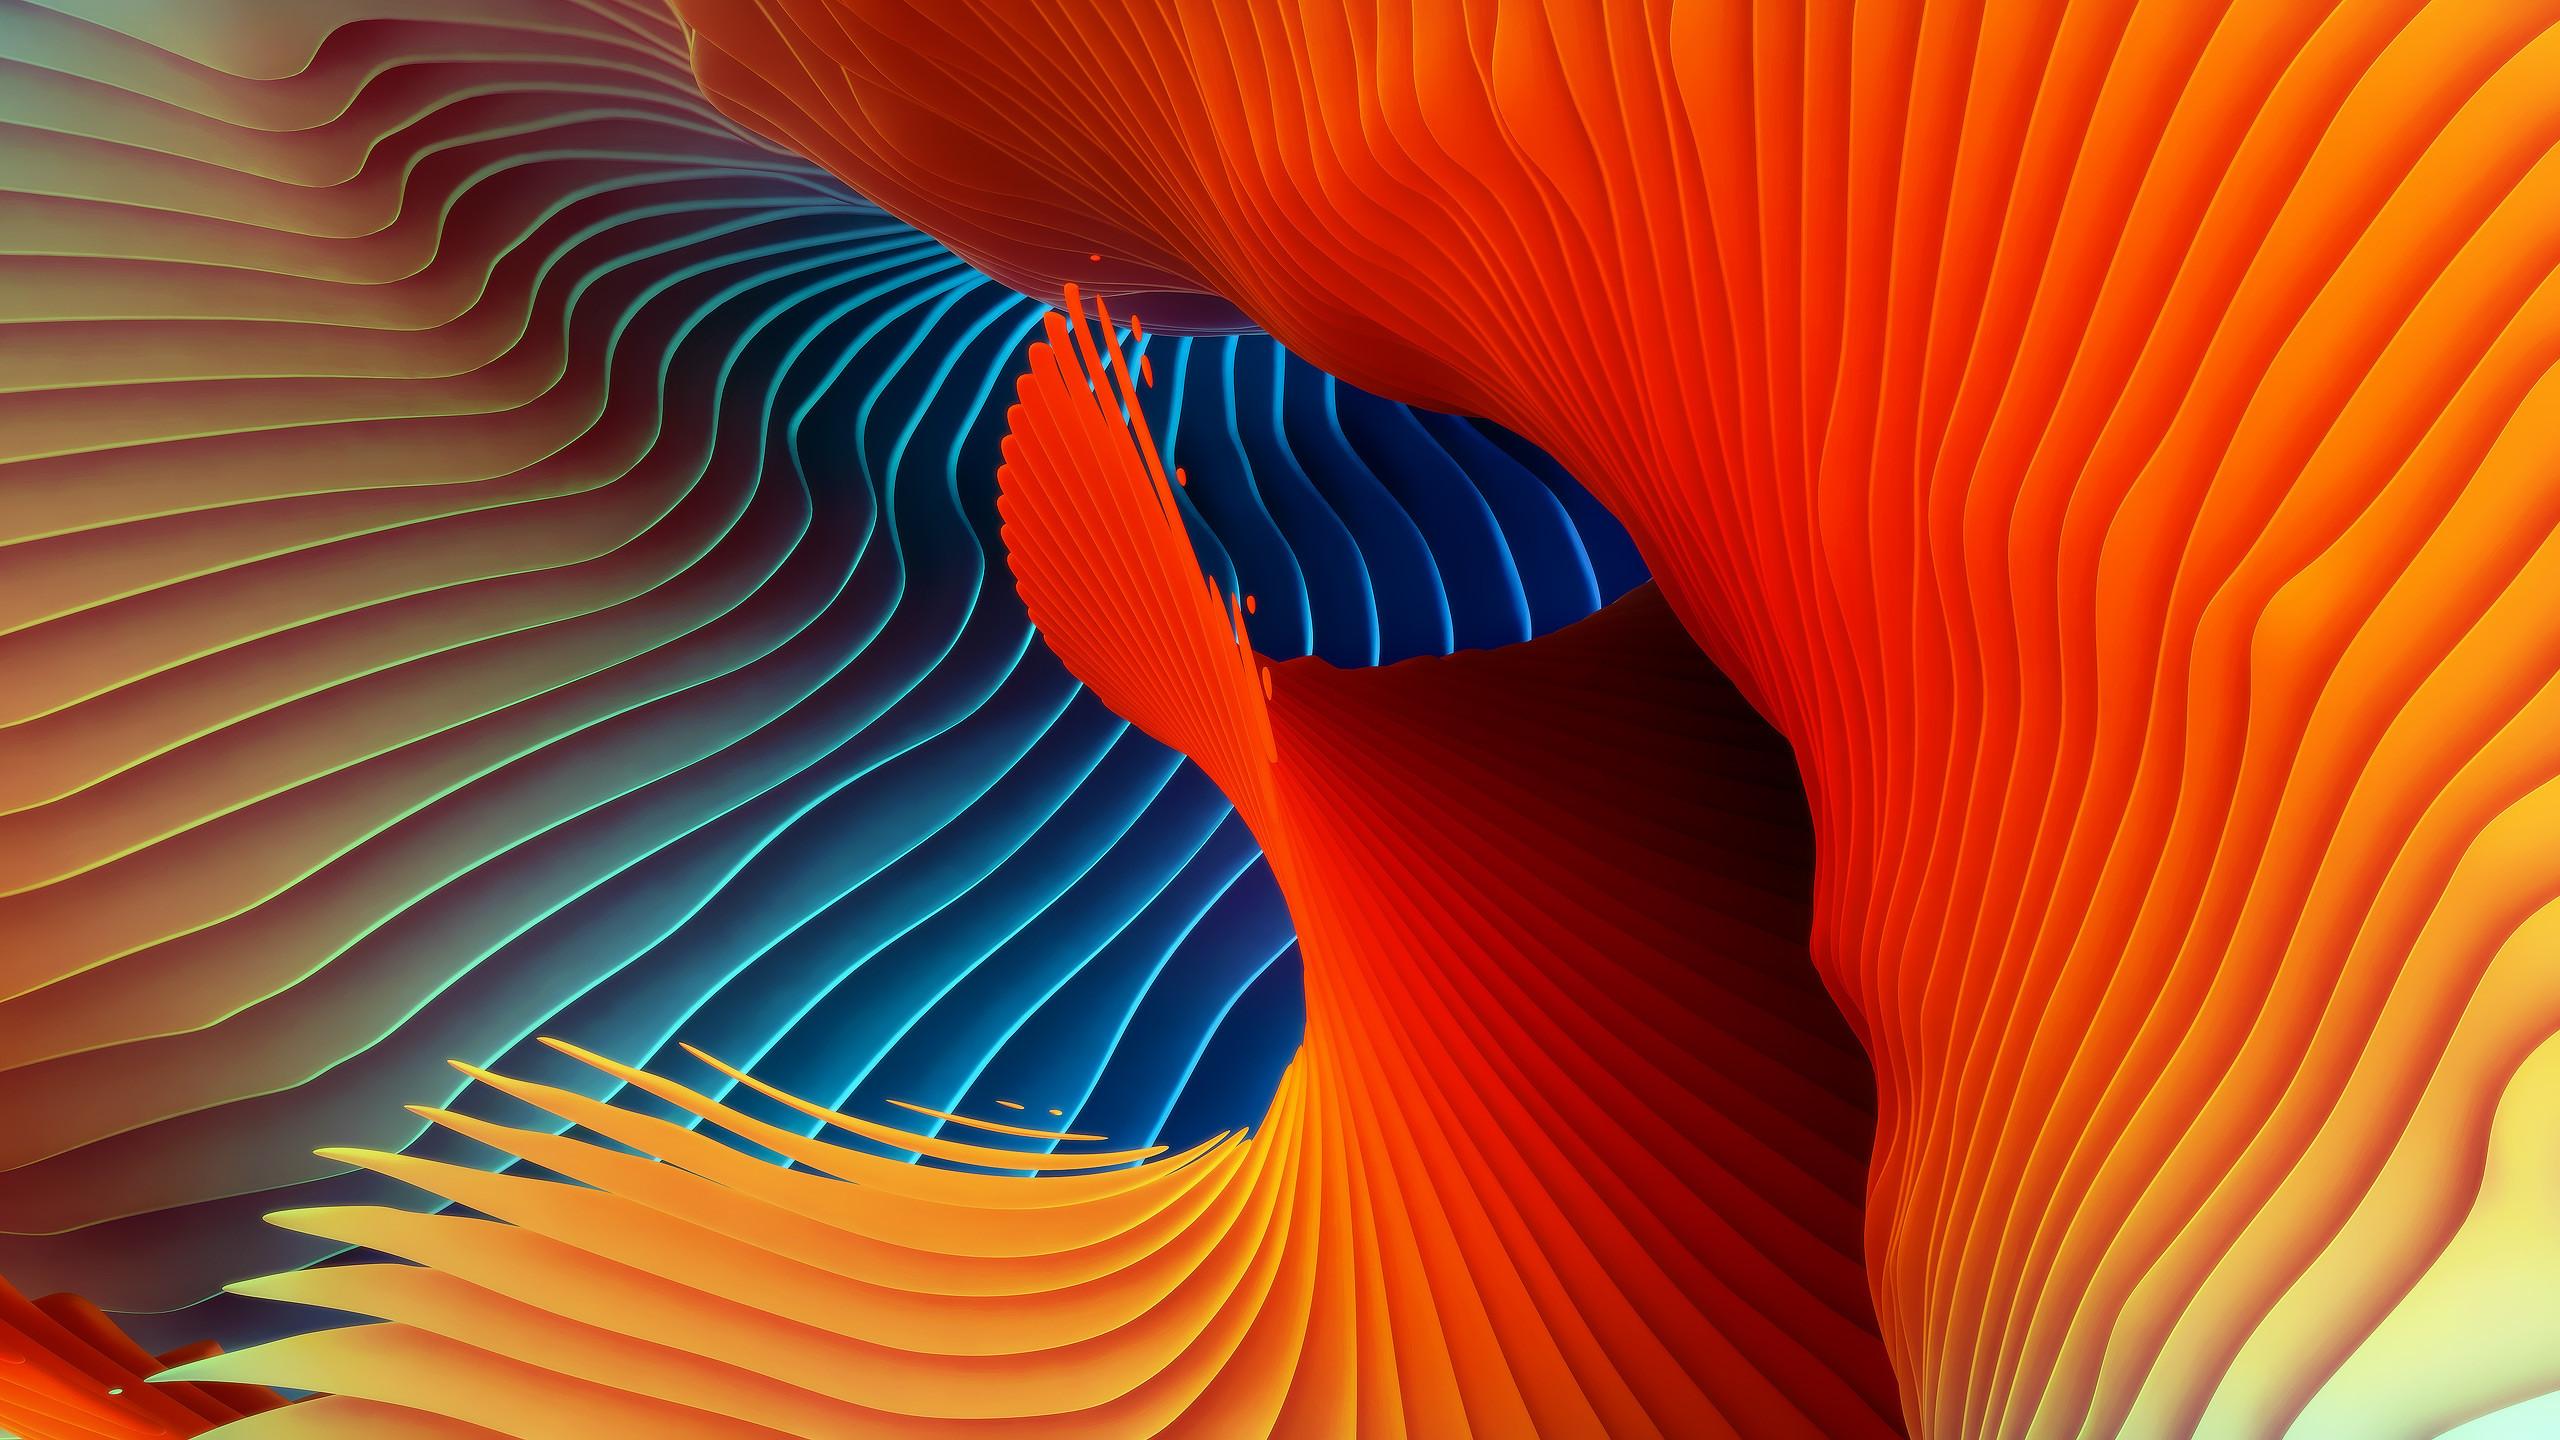 MacBook Pro Event Wallpaper ari weinkle Spiral_4B. Download via  @airweinkle: desktop (2560 …